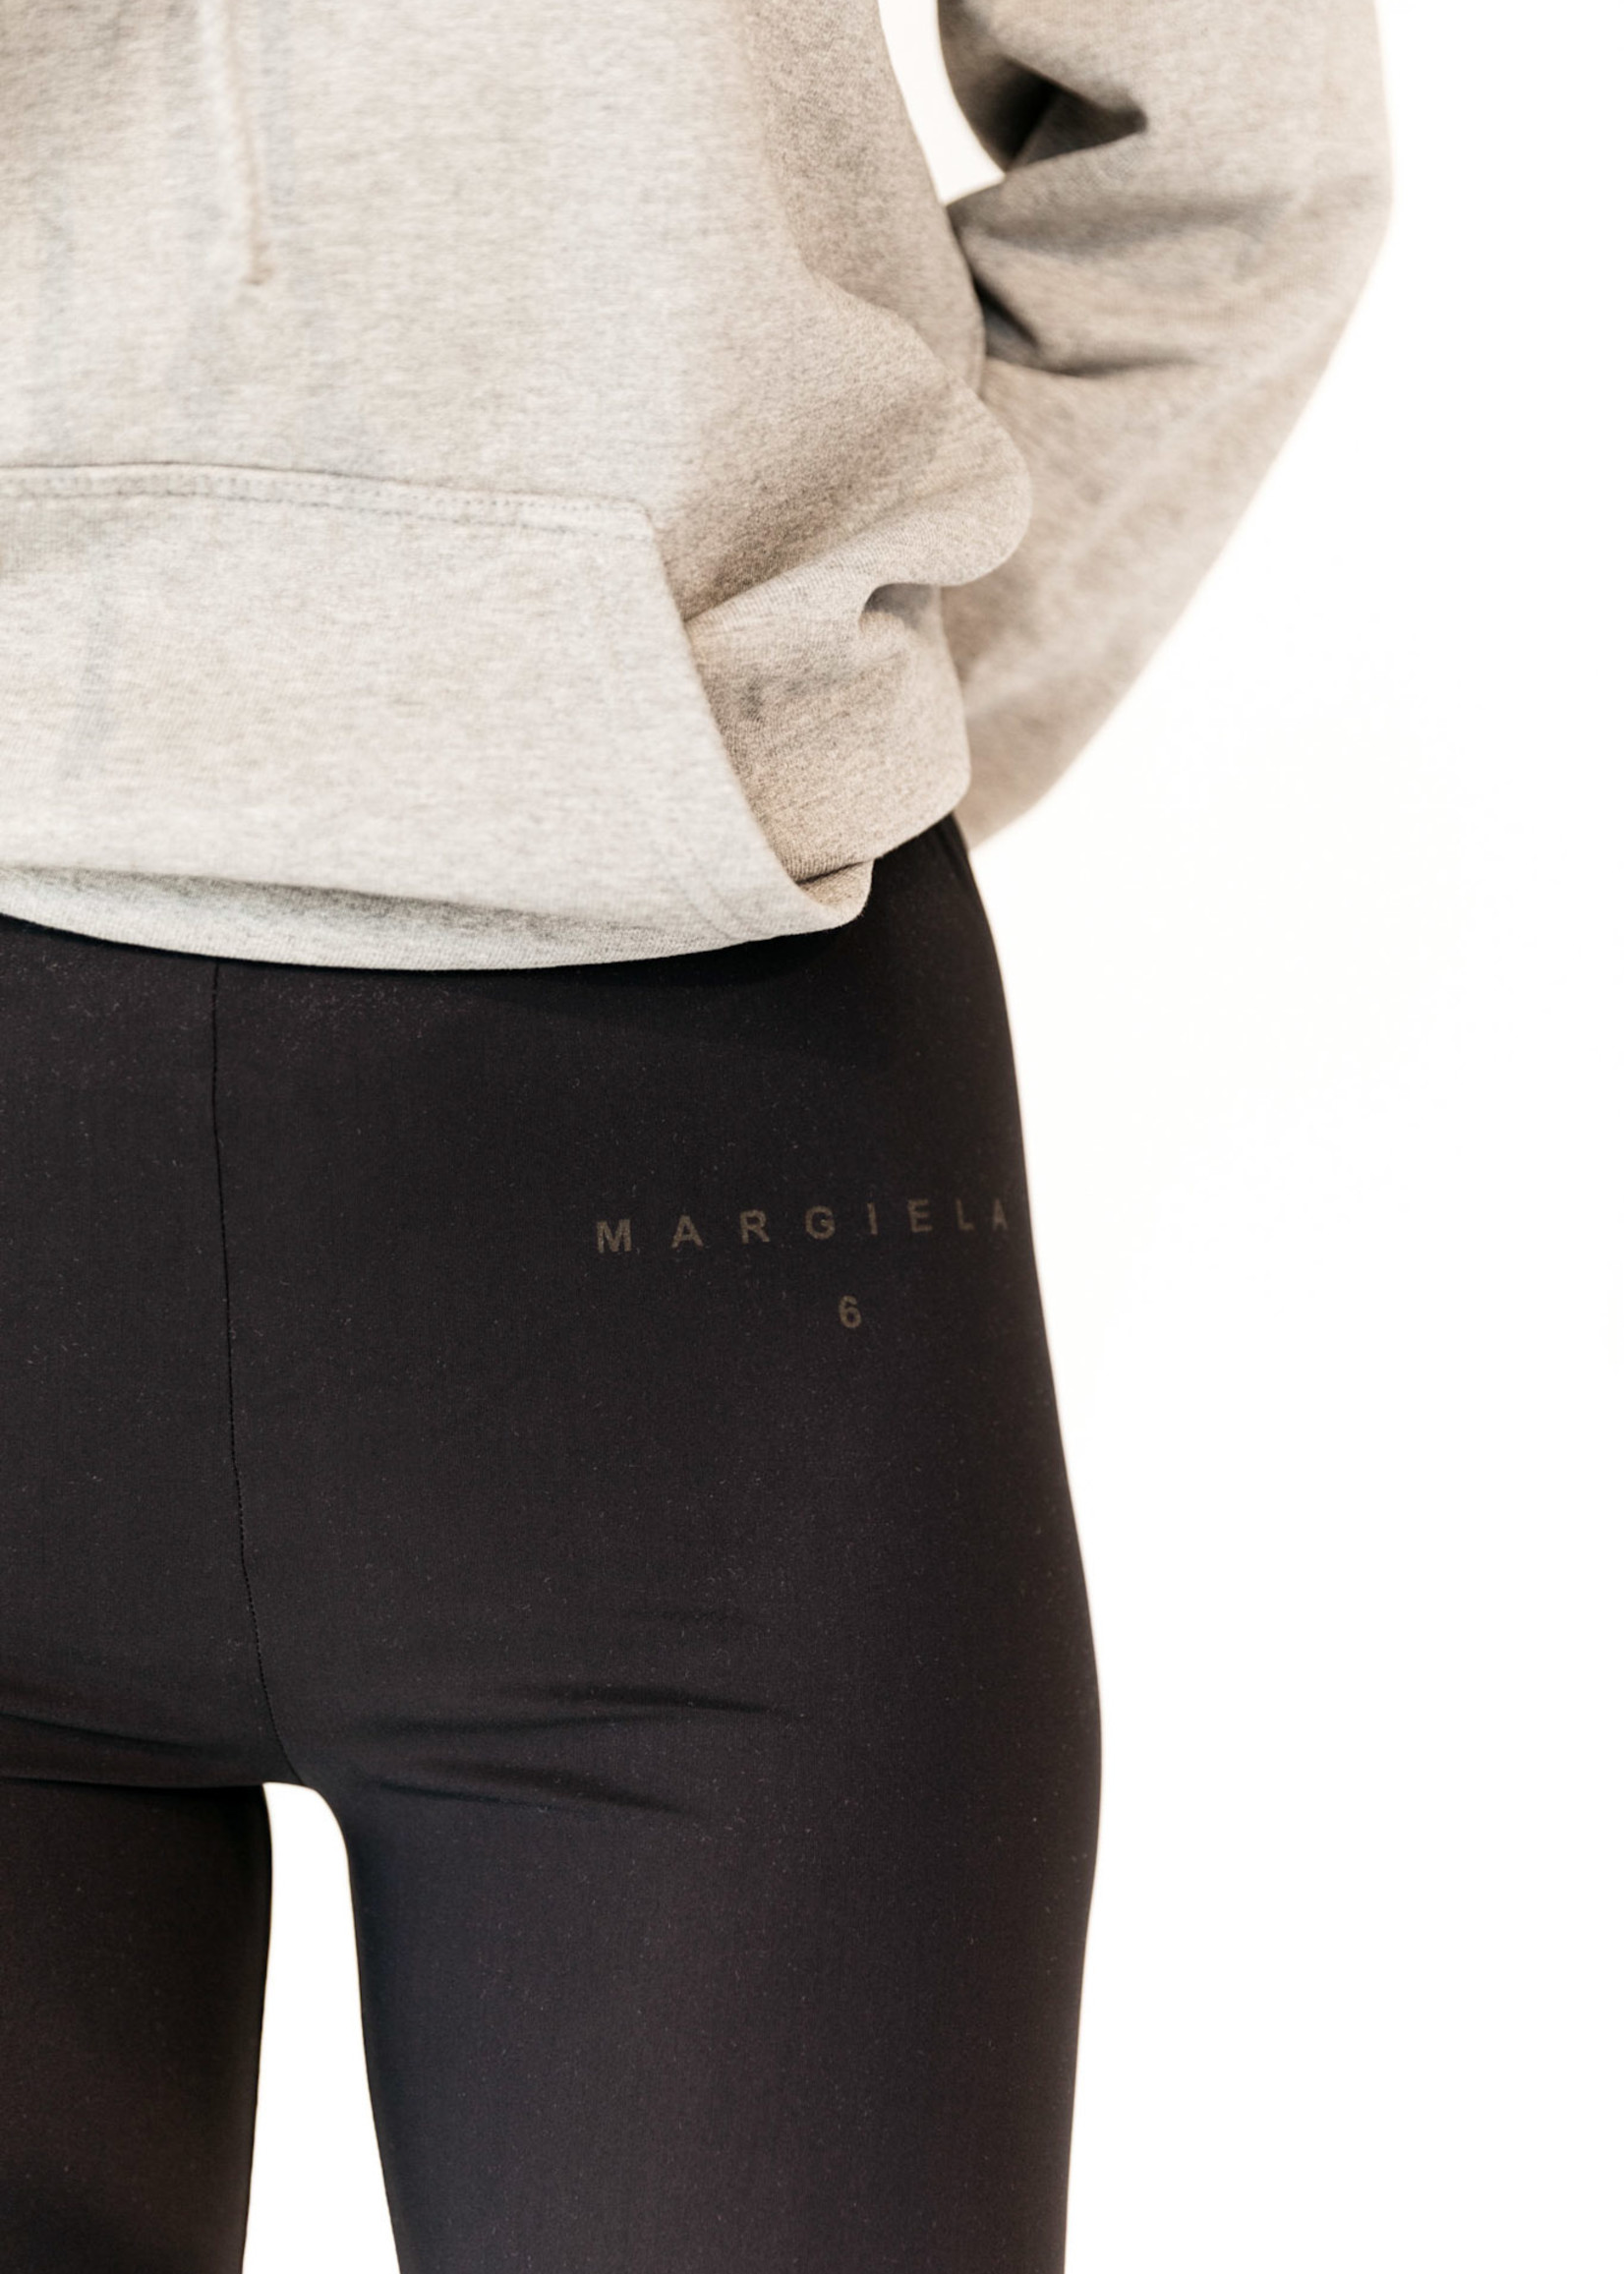 MM6 MAISON MARGIELA Logo Bike Shorts in Black